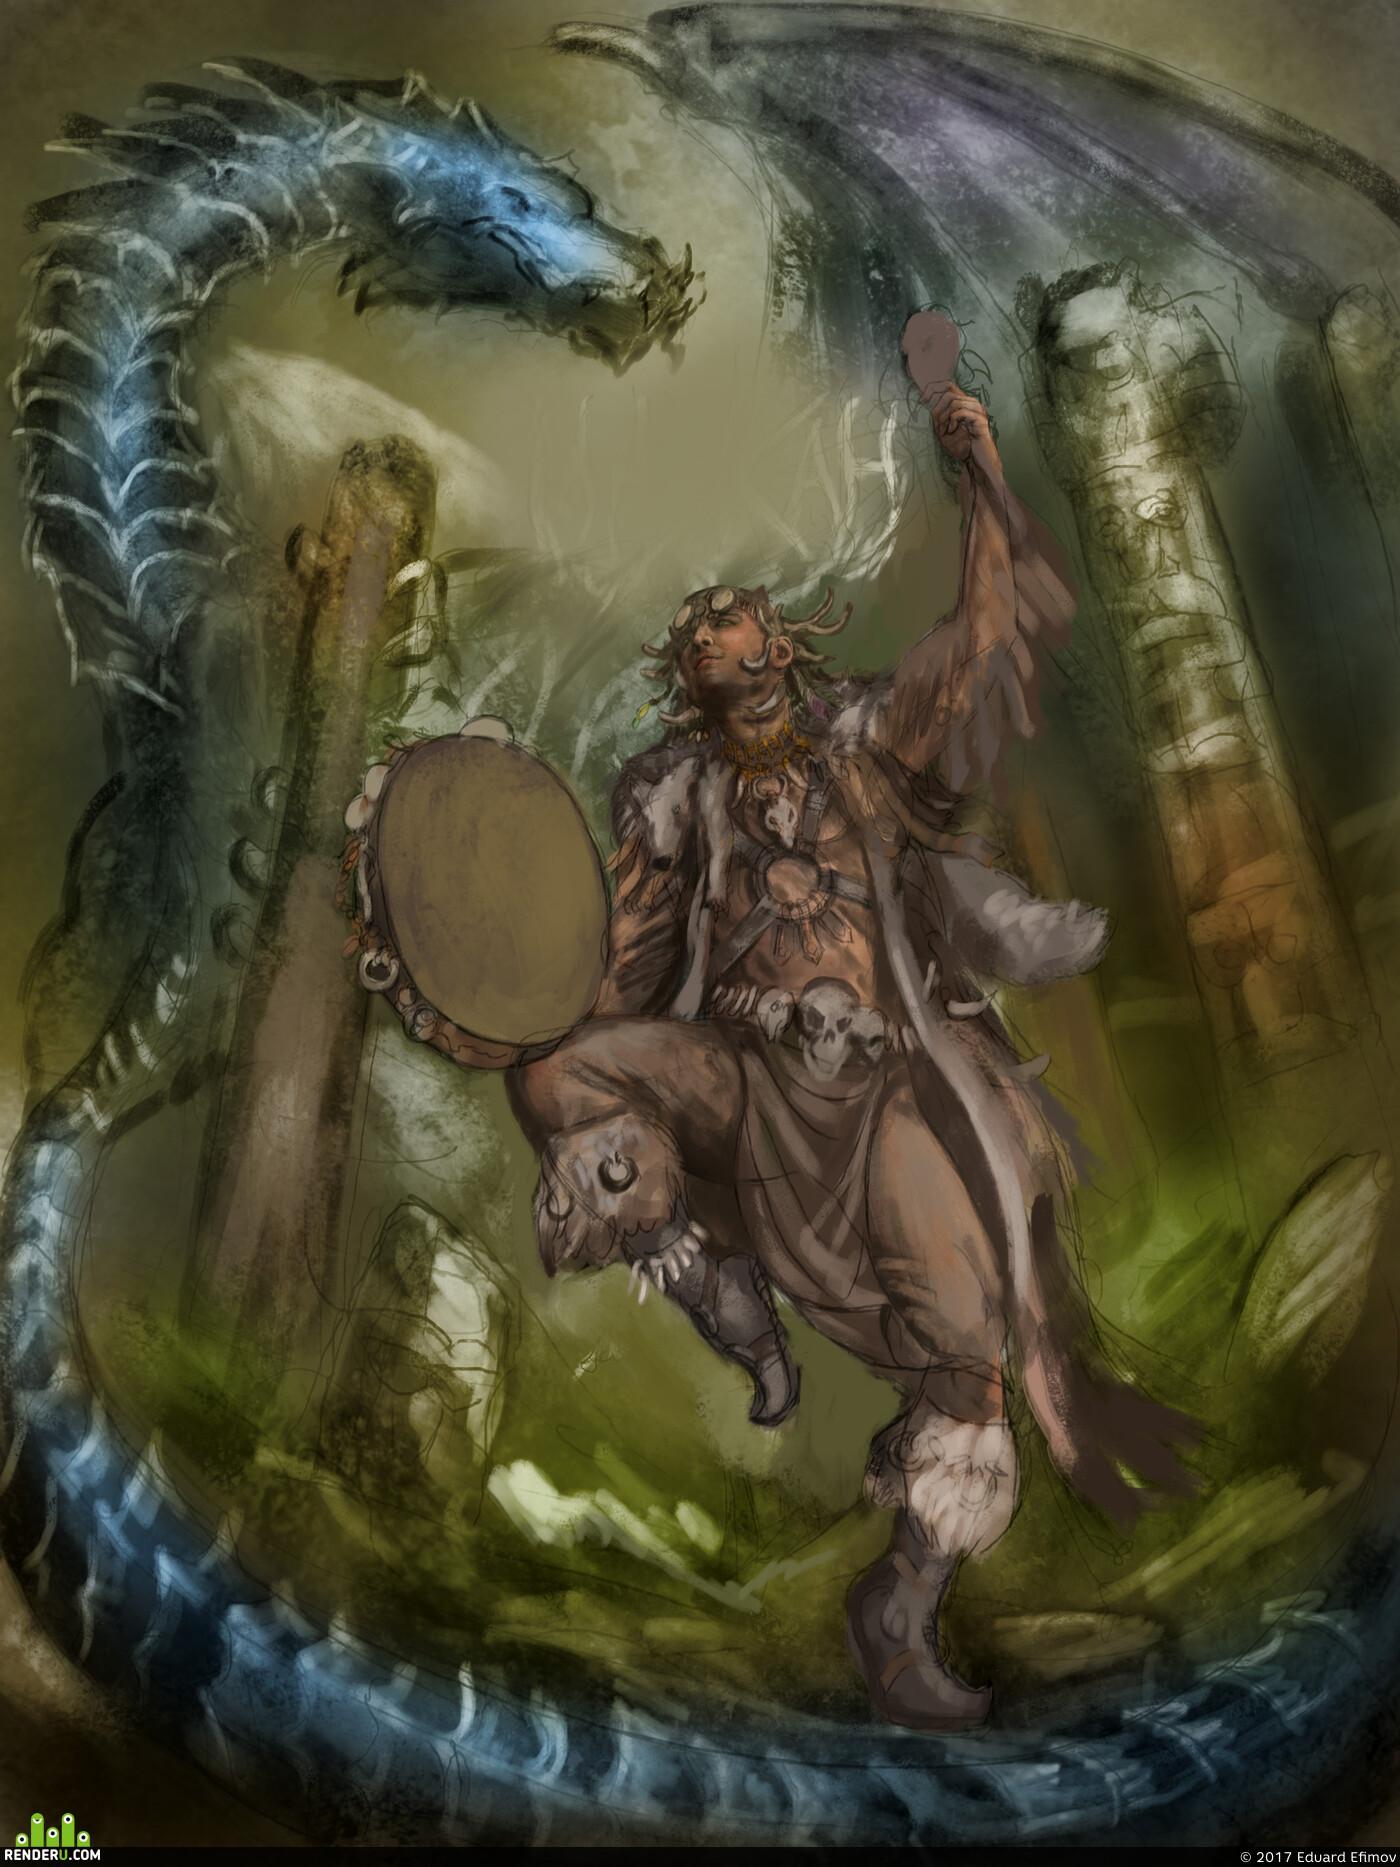 illustration, sg, ediktart, edikt, art, dragon, shaman, soul, spirit